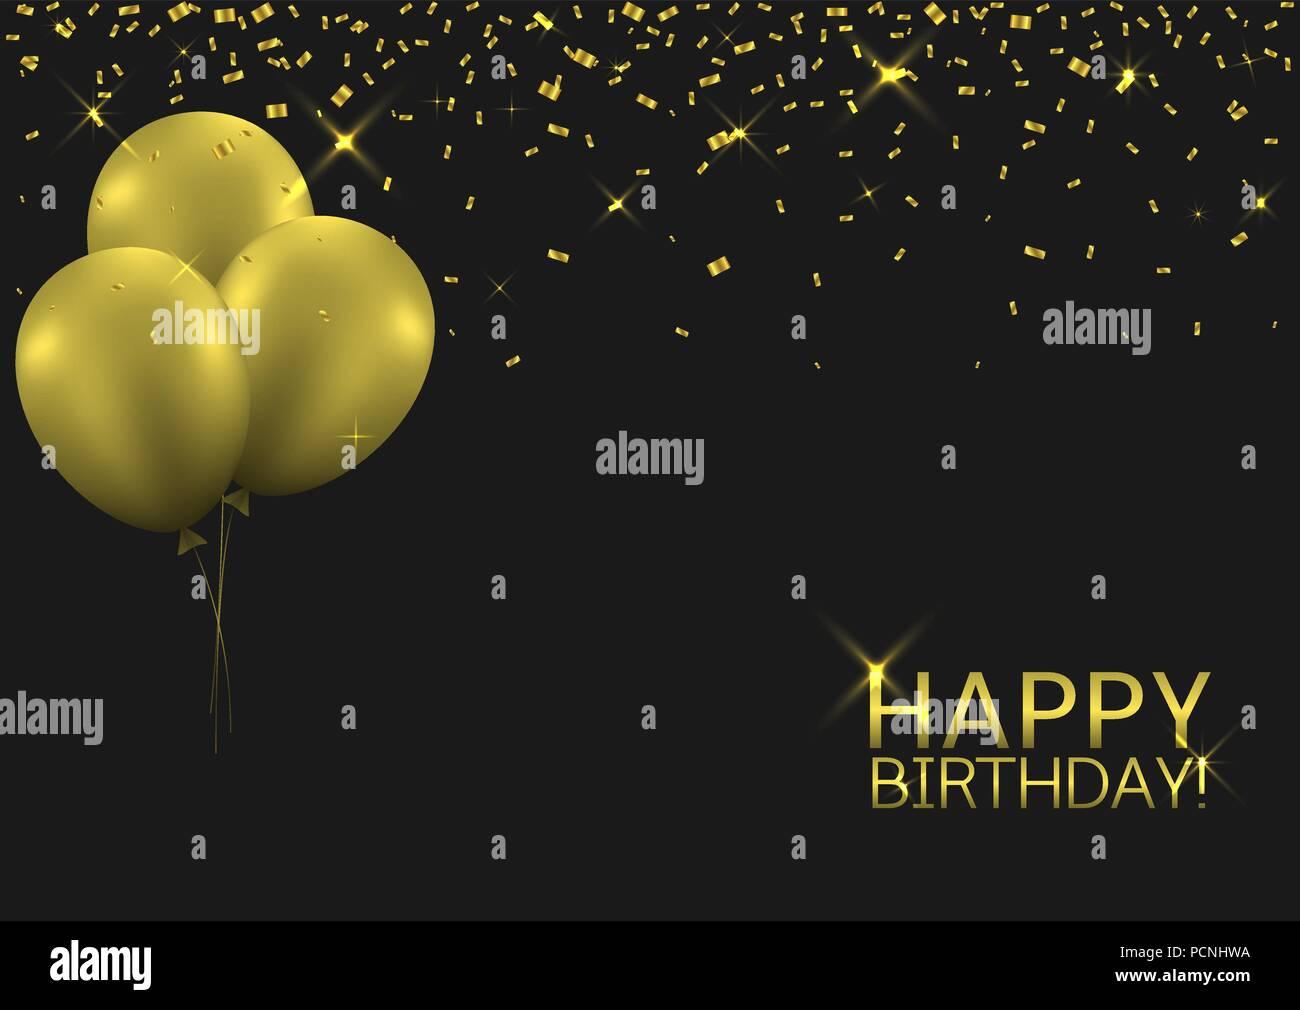 Happy Birthday Background Stock Vector Art Illustration